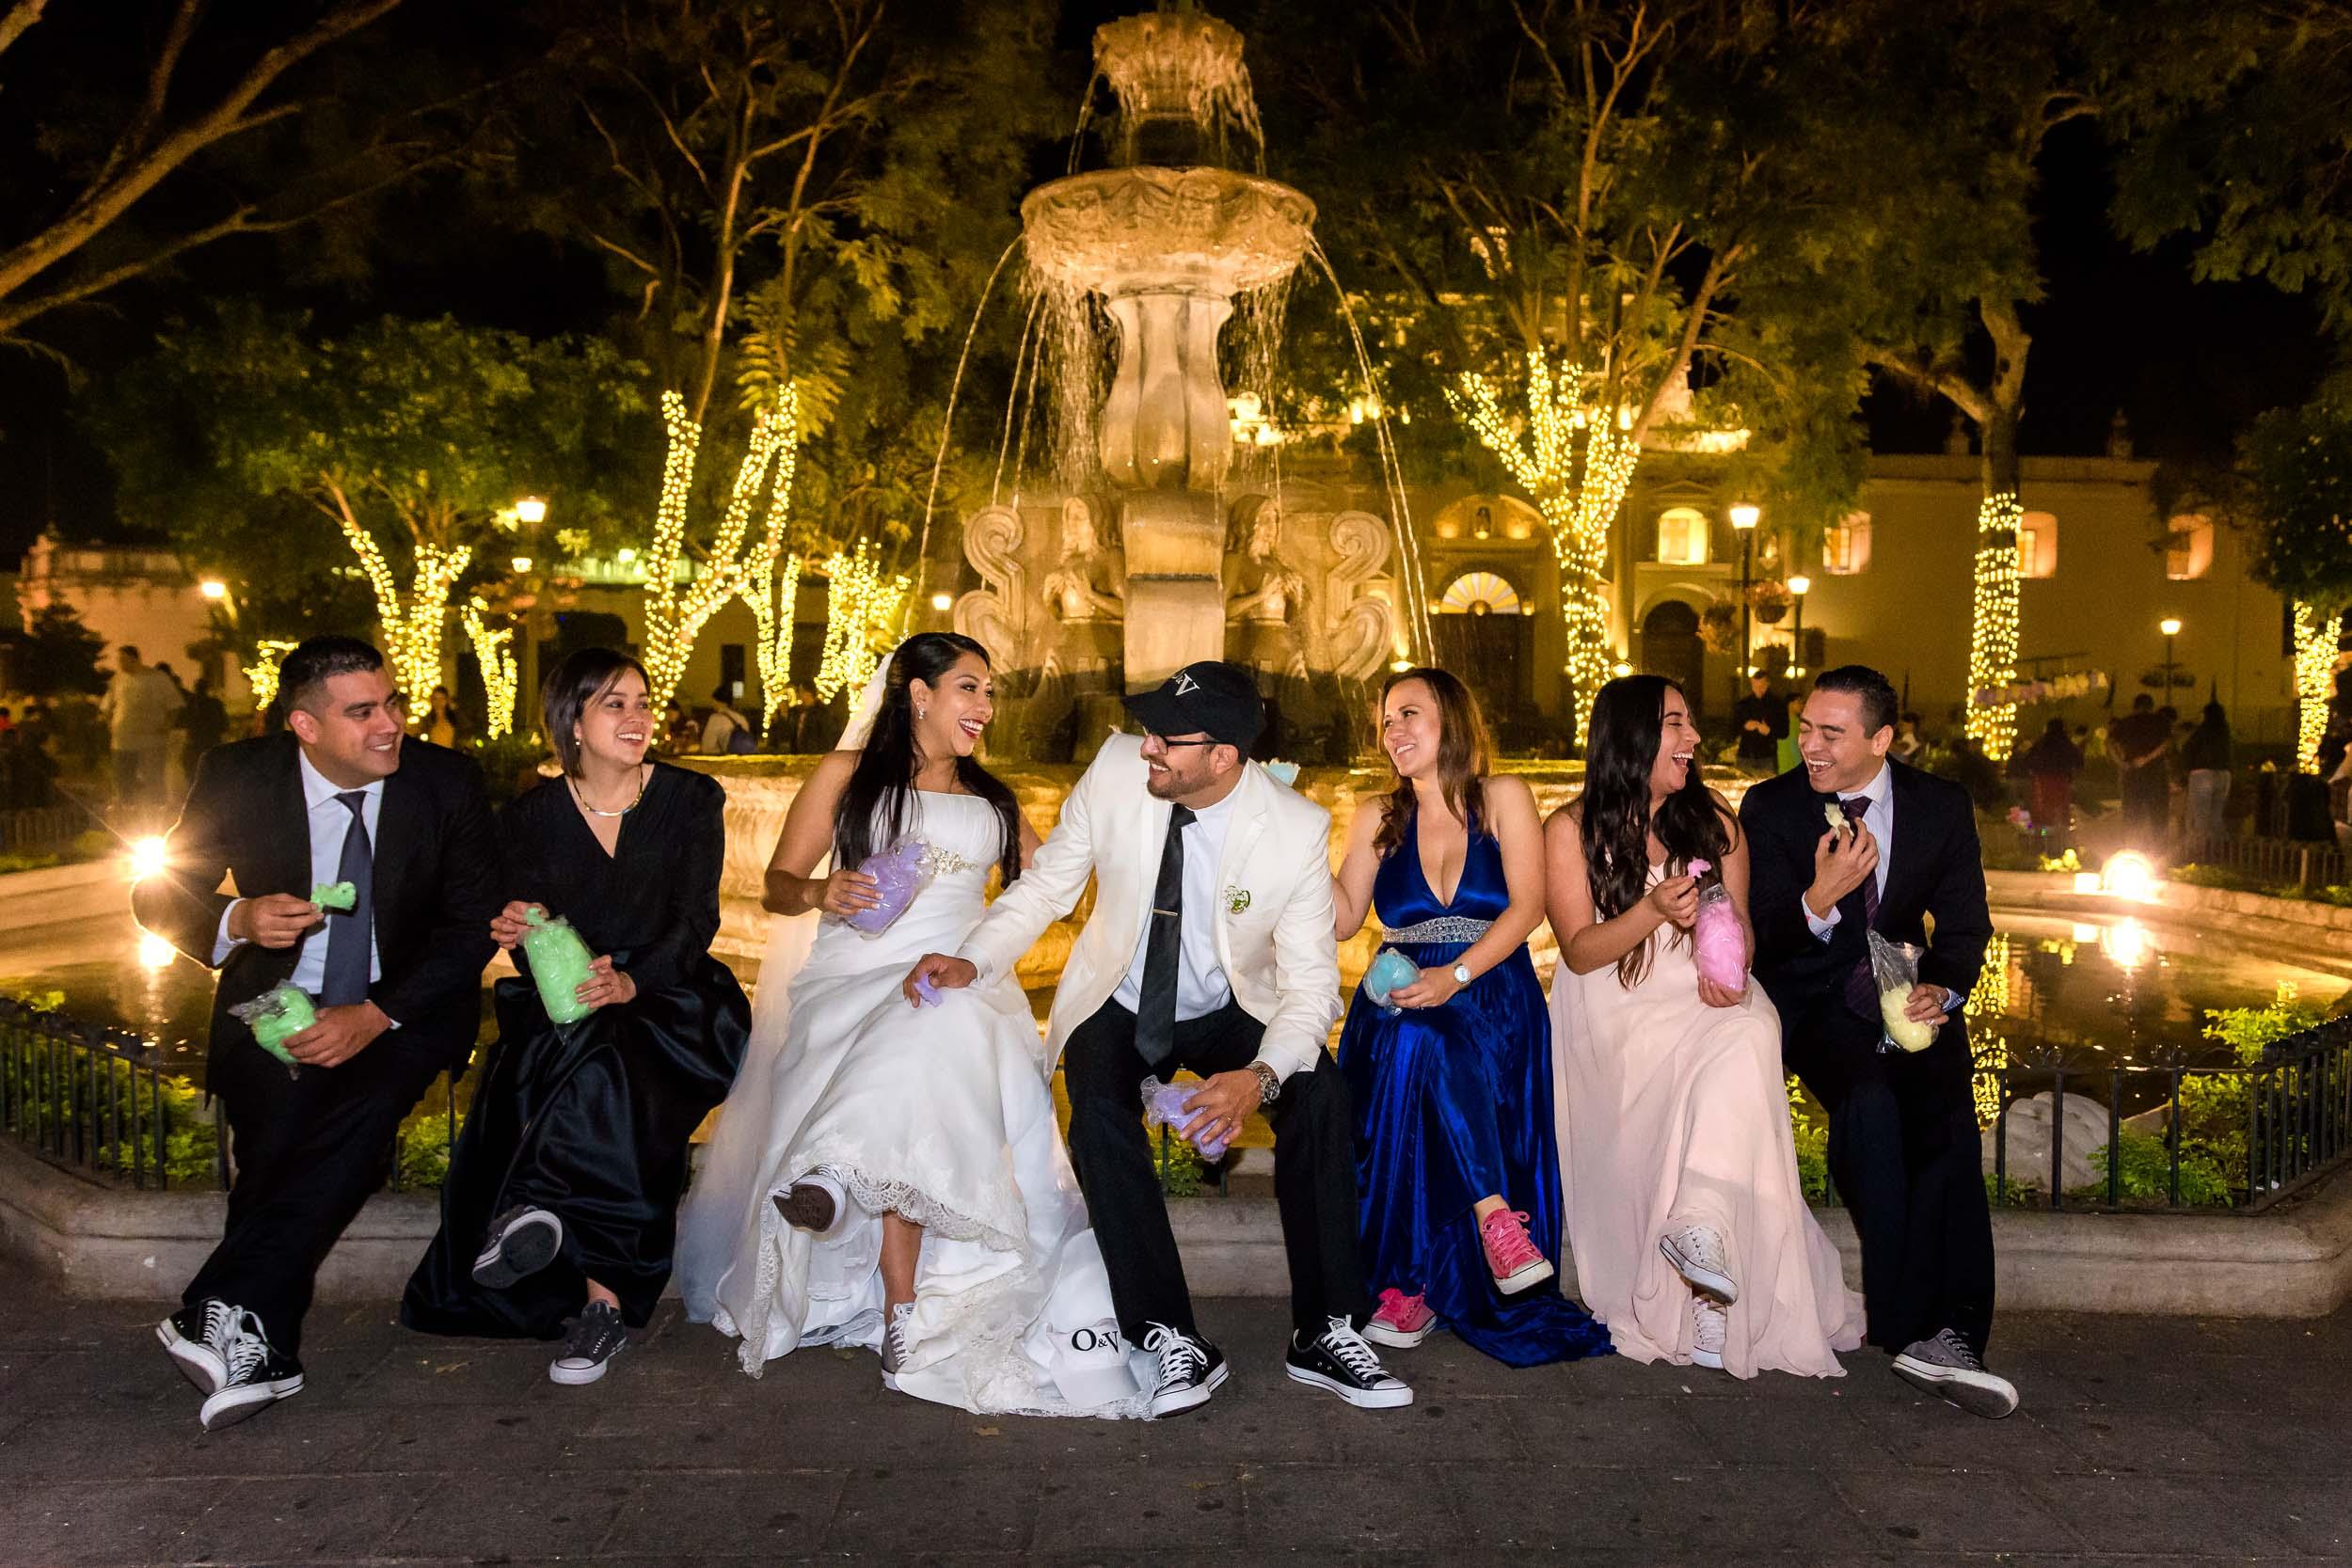 RobertoLainez-Foto-Bodas-Guatemala-354-20161217.jpg